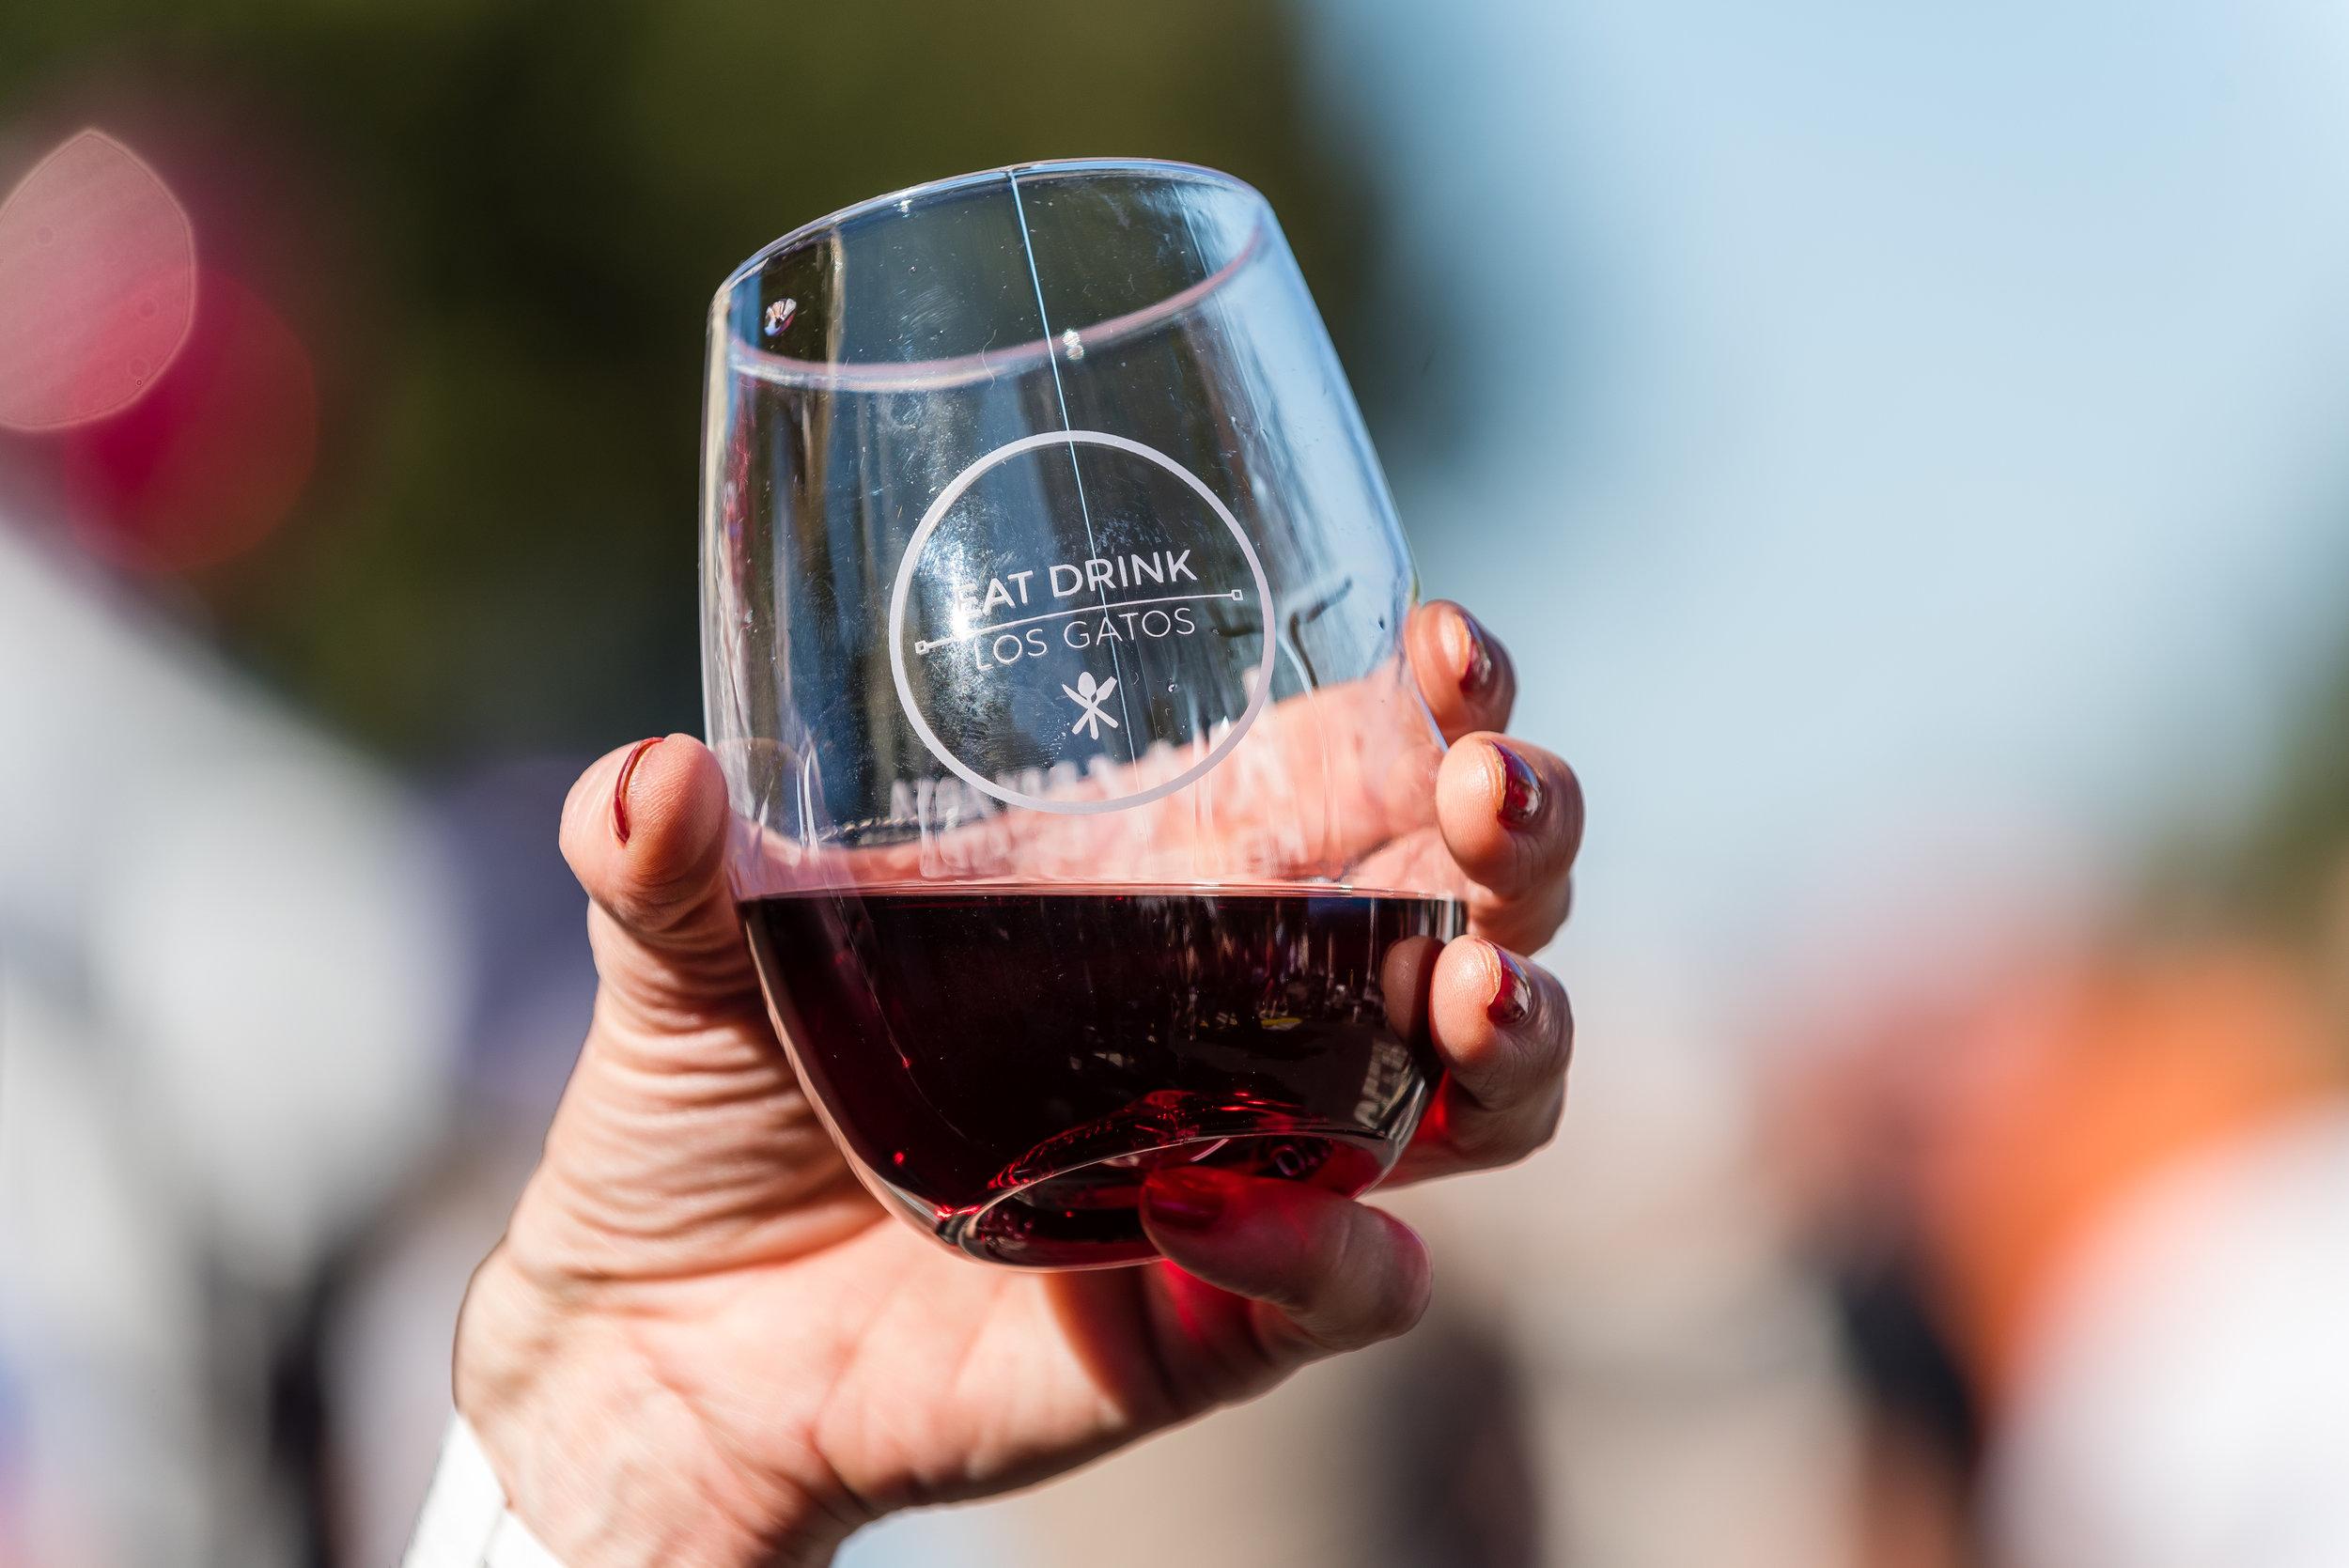 Local Wineries - Testarossa WineryLeft Bend WineryRootstock Wine BarWrights Station Vineryard & Wineryand more…Elevated Wine Tasting Experience at: the NEW Pastaria & Market at 27 N. Santa Cruz and Rootstock at 217 N. Santa Cruz Avenue. 4-5 tastes and small bites.